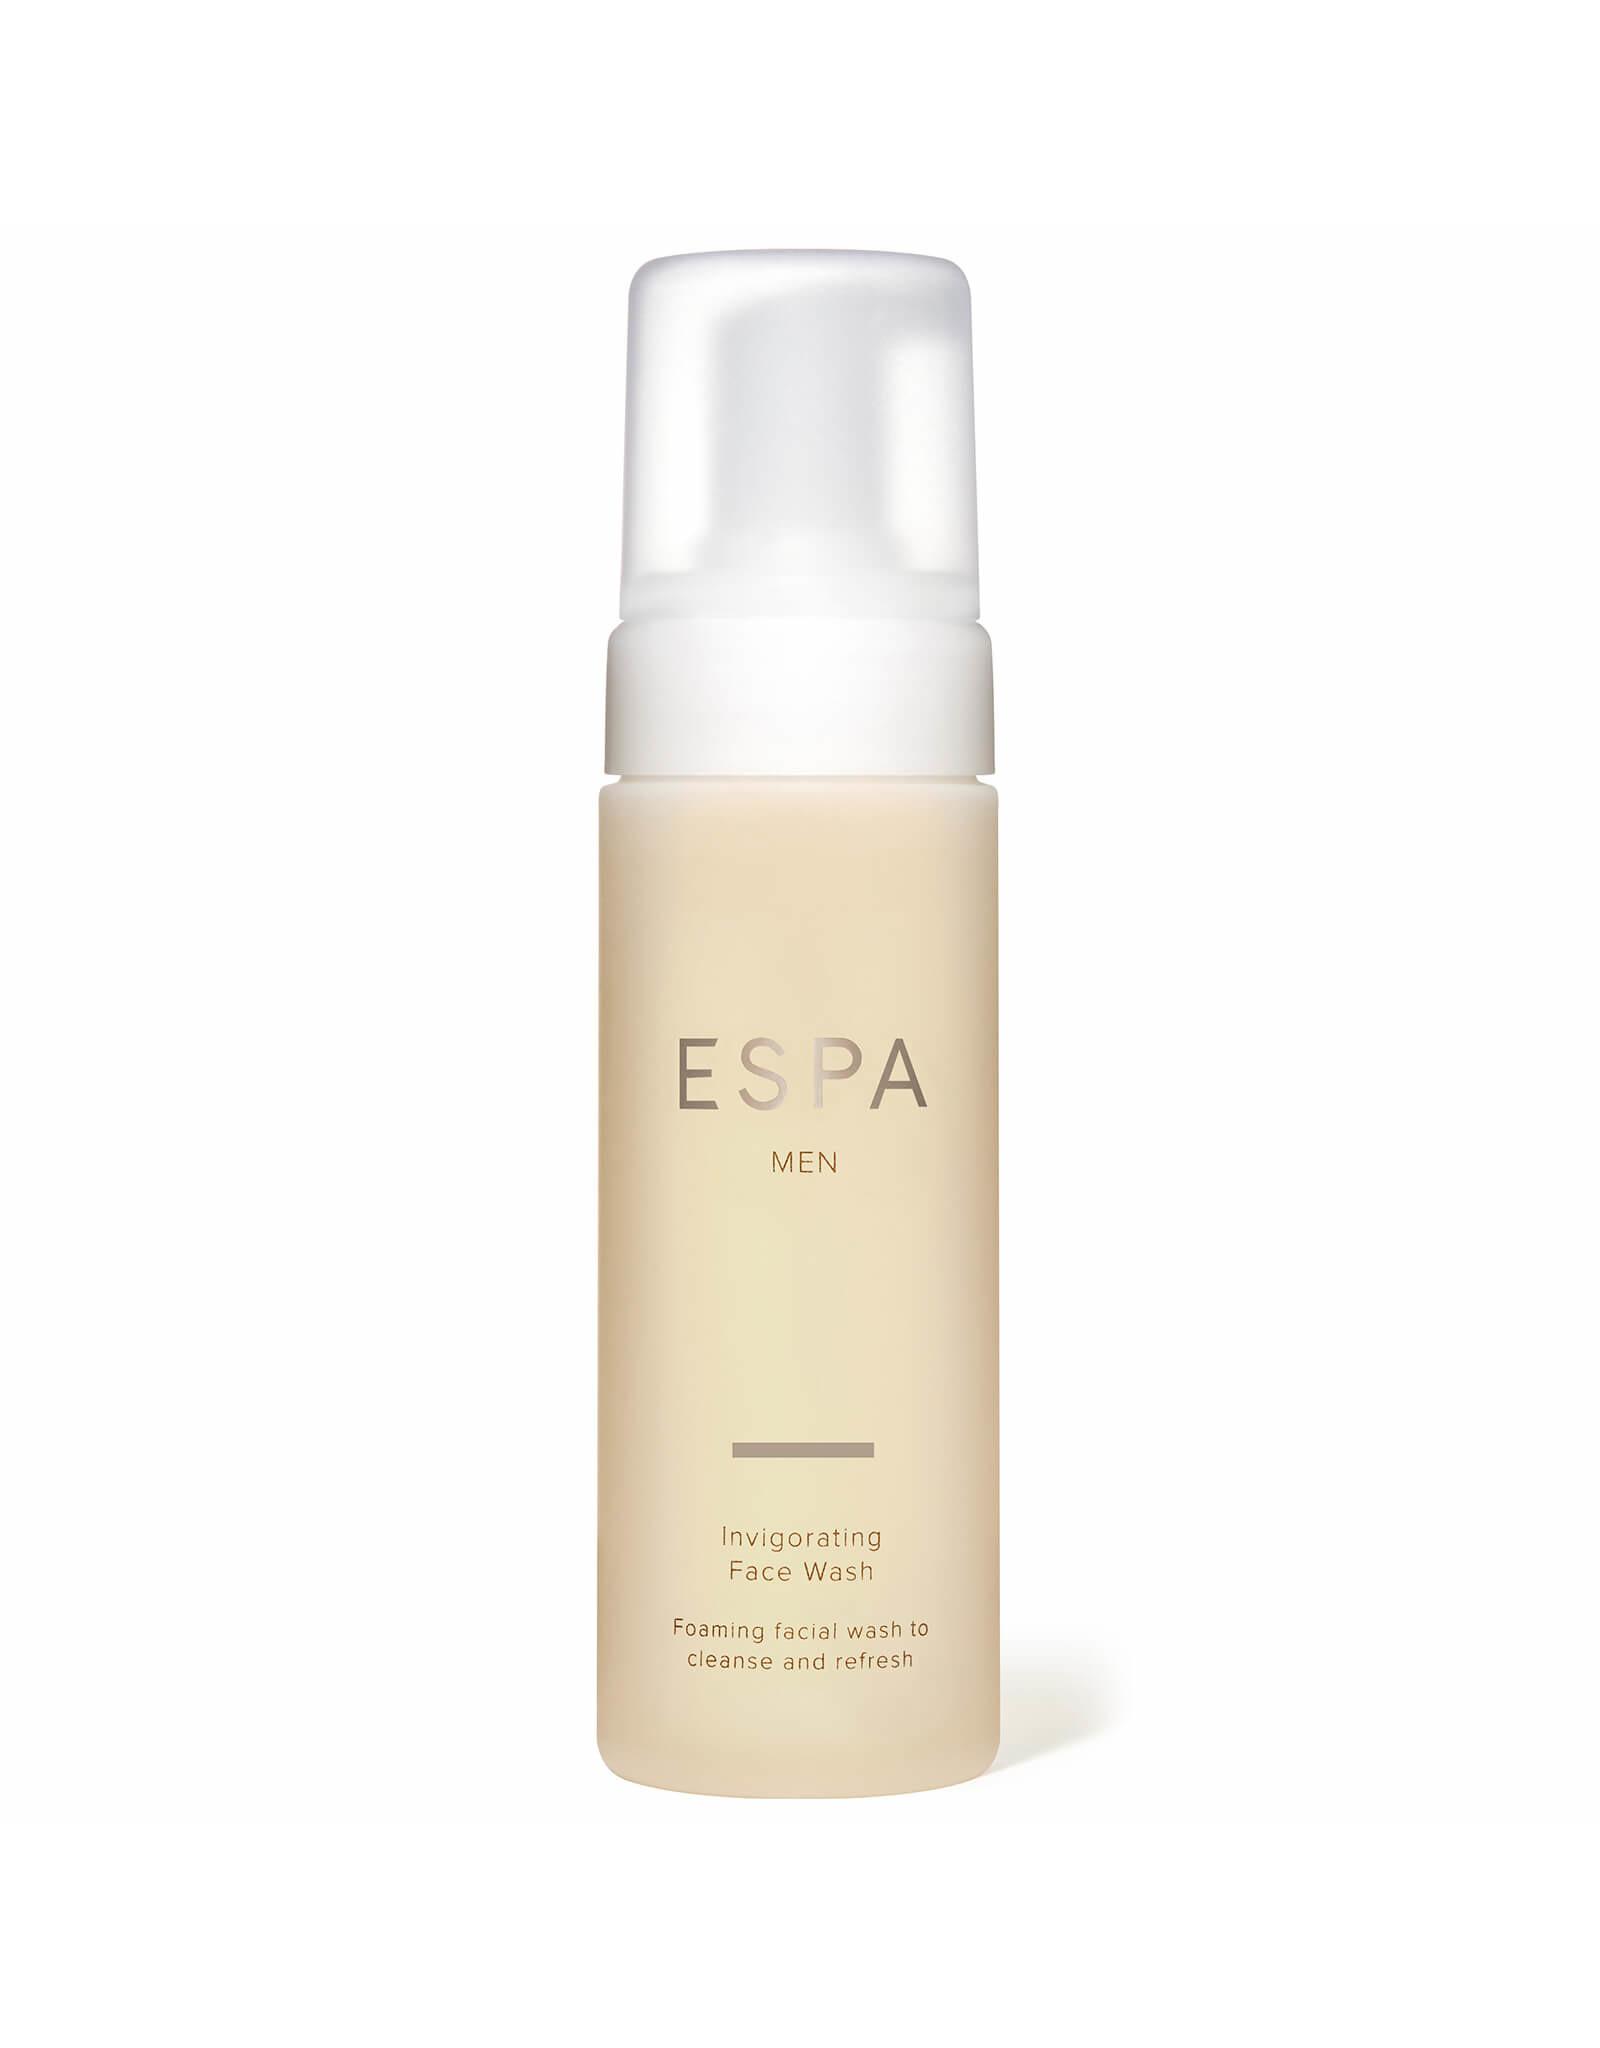 ESPA Men Invigorating Facewash, 150ml